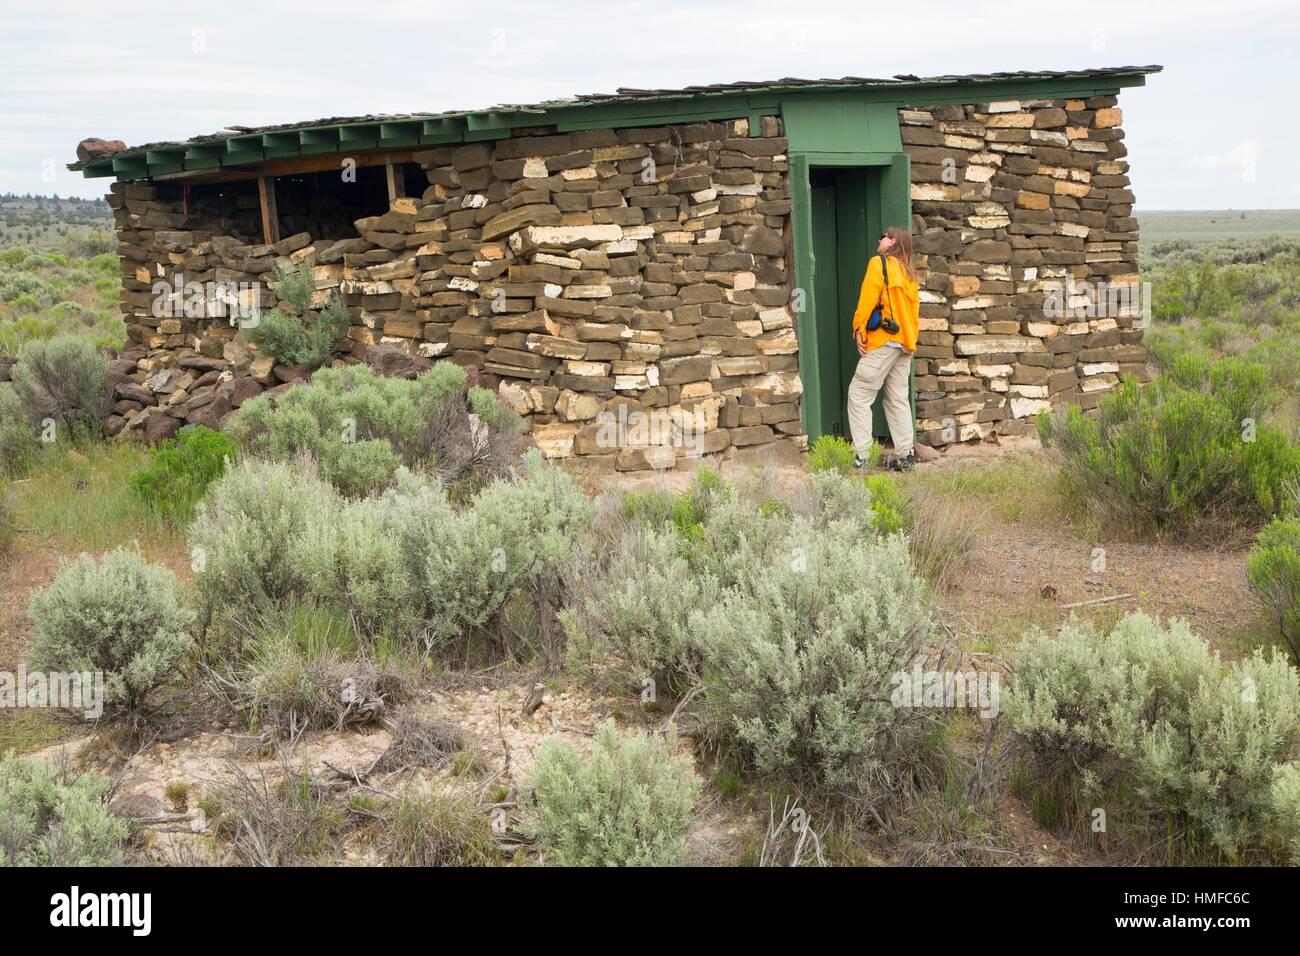 Cold Storage Building, Camp Gap Ranch, Burns District Bureau of Land Management, Oregon. - Stock Image